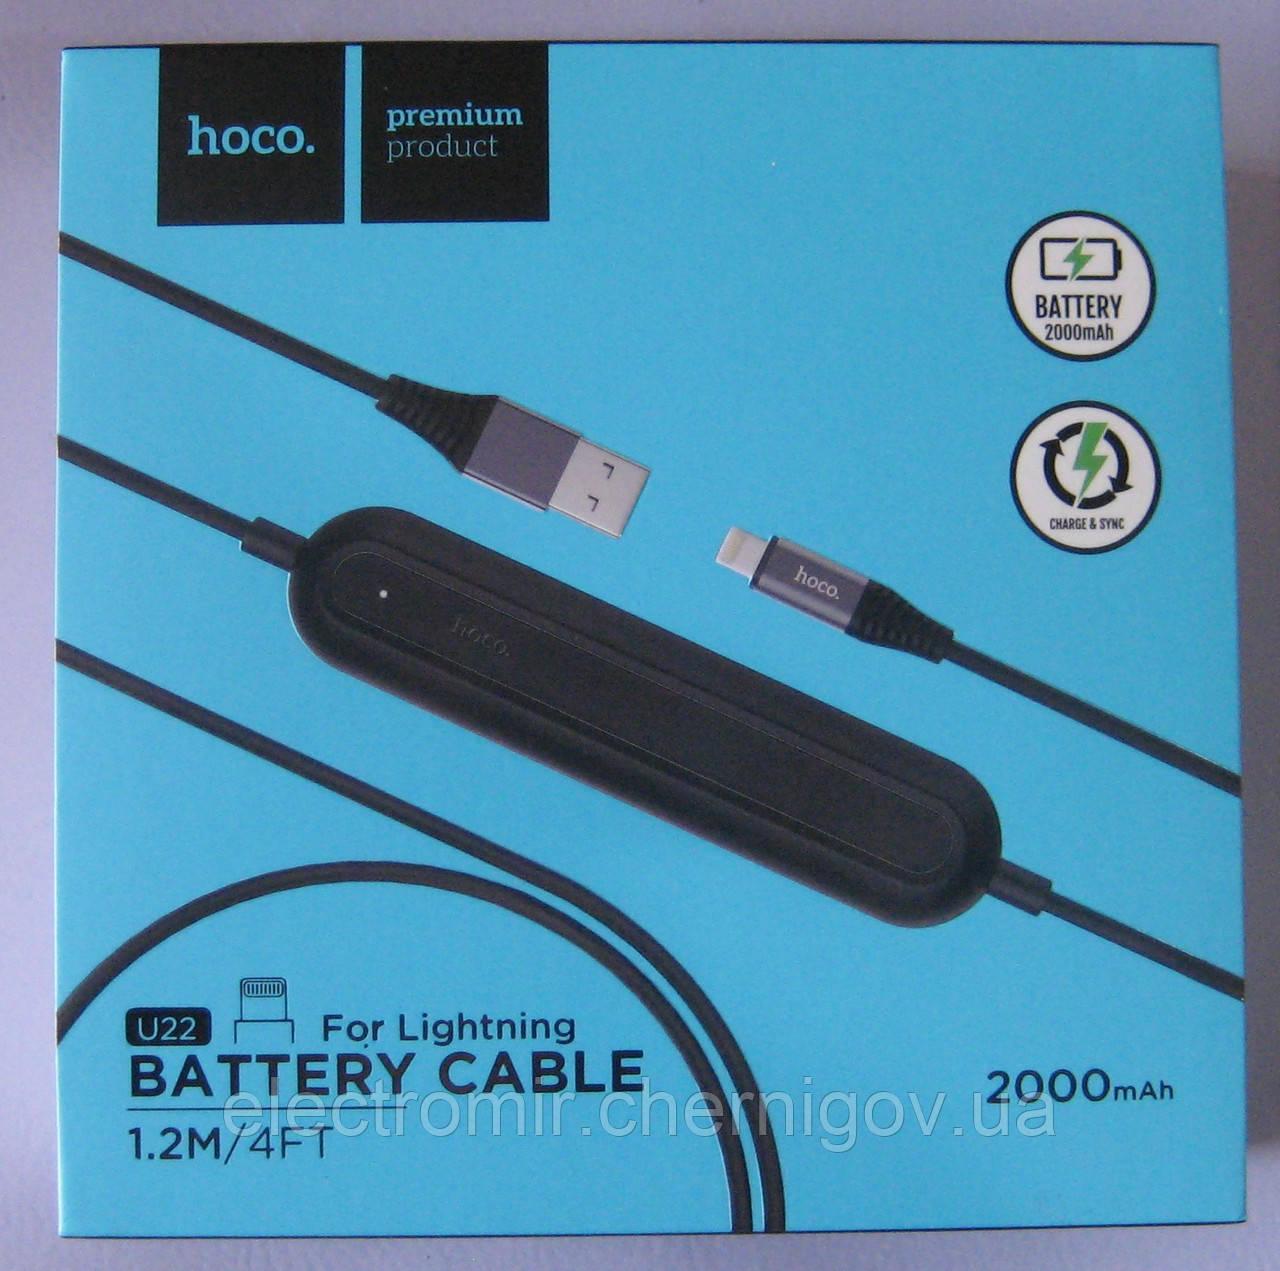 USB кабель с аккумулятором HOCO U22 Black USB to Lightning 1.2m для I-Phone